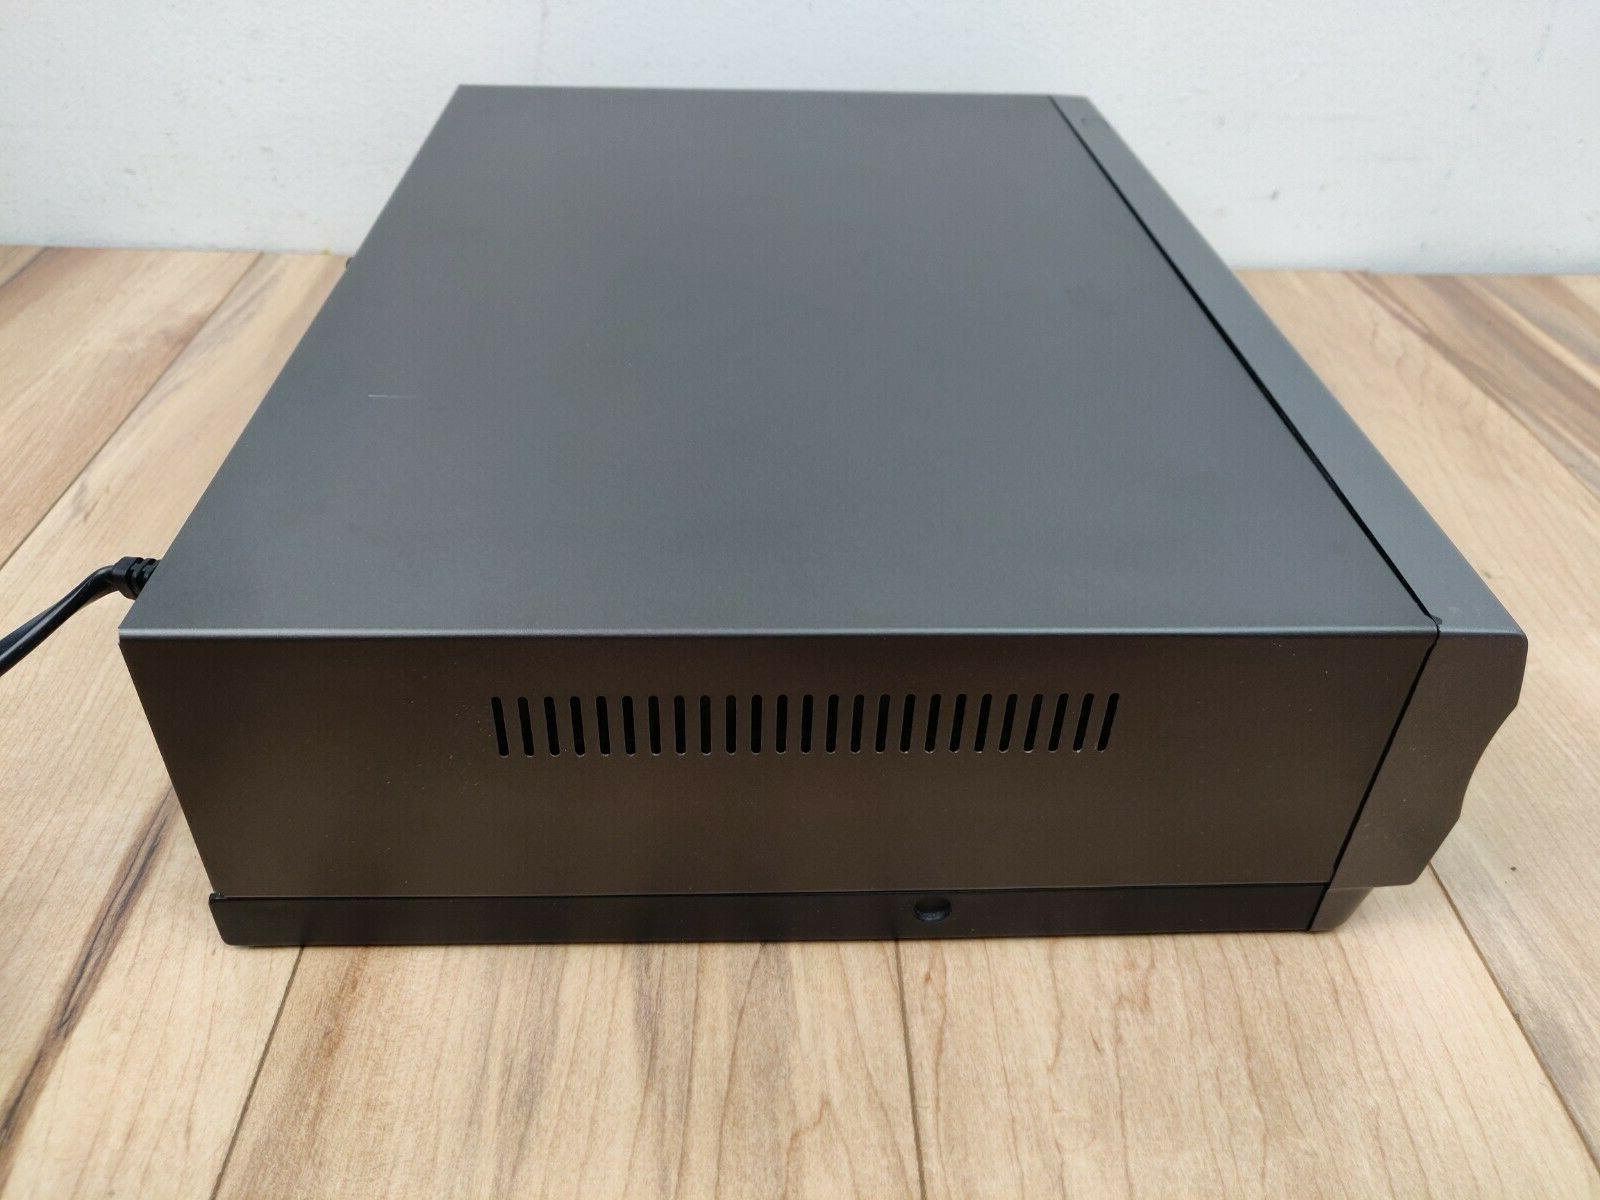 Toshiba Head Hi-Fi Stereo Player Tested